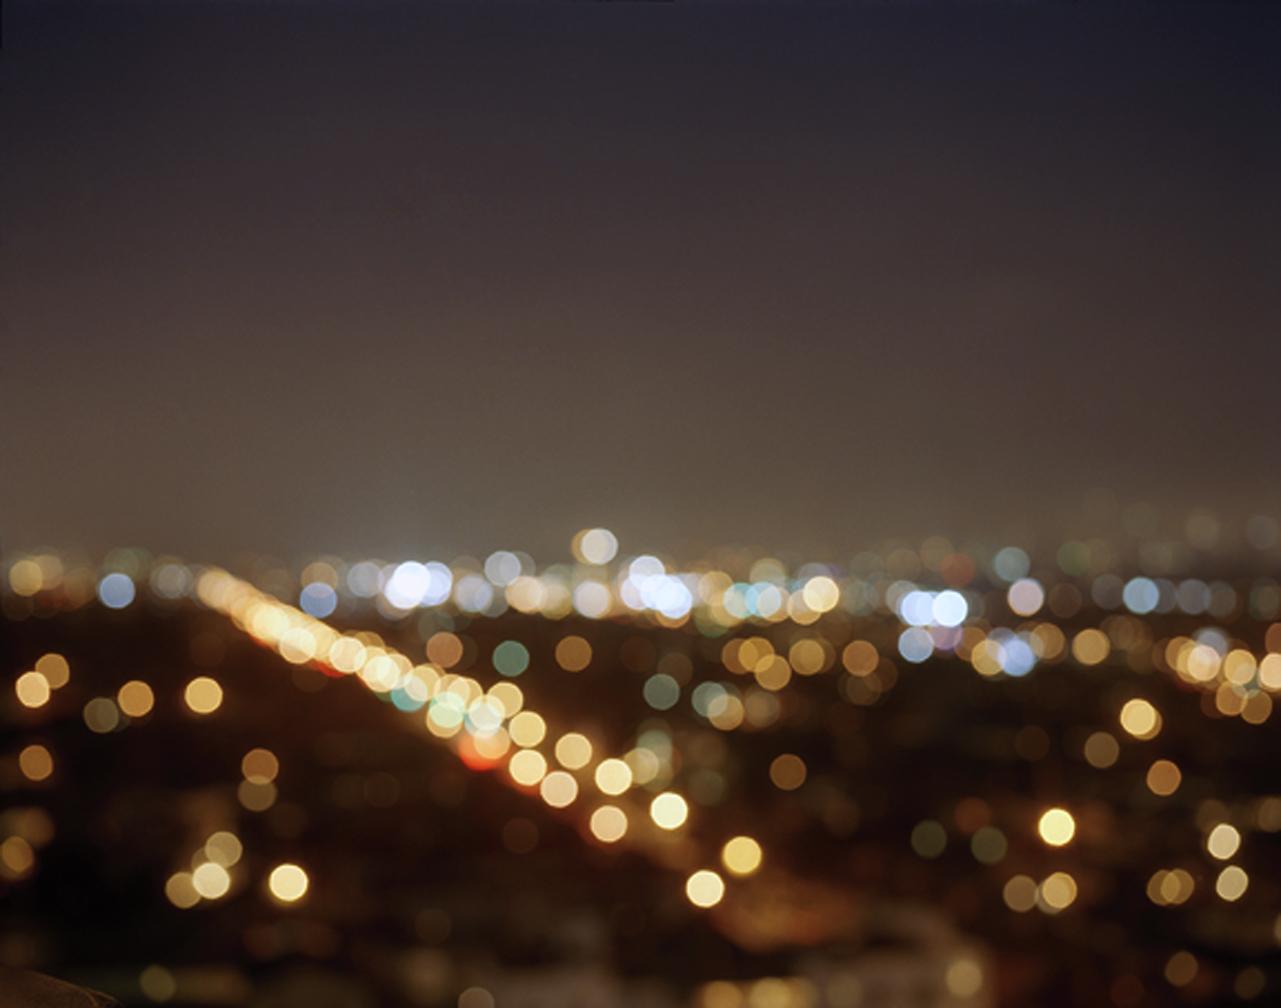 """Bright Lights, Blurry Dreams"", Los Angeles, Ca 2004"